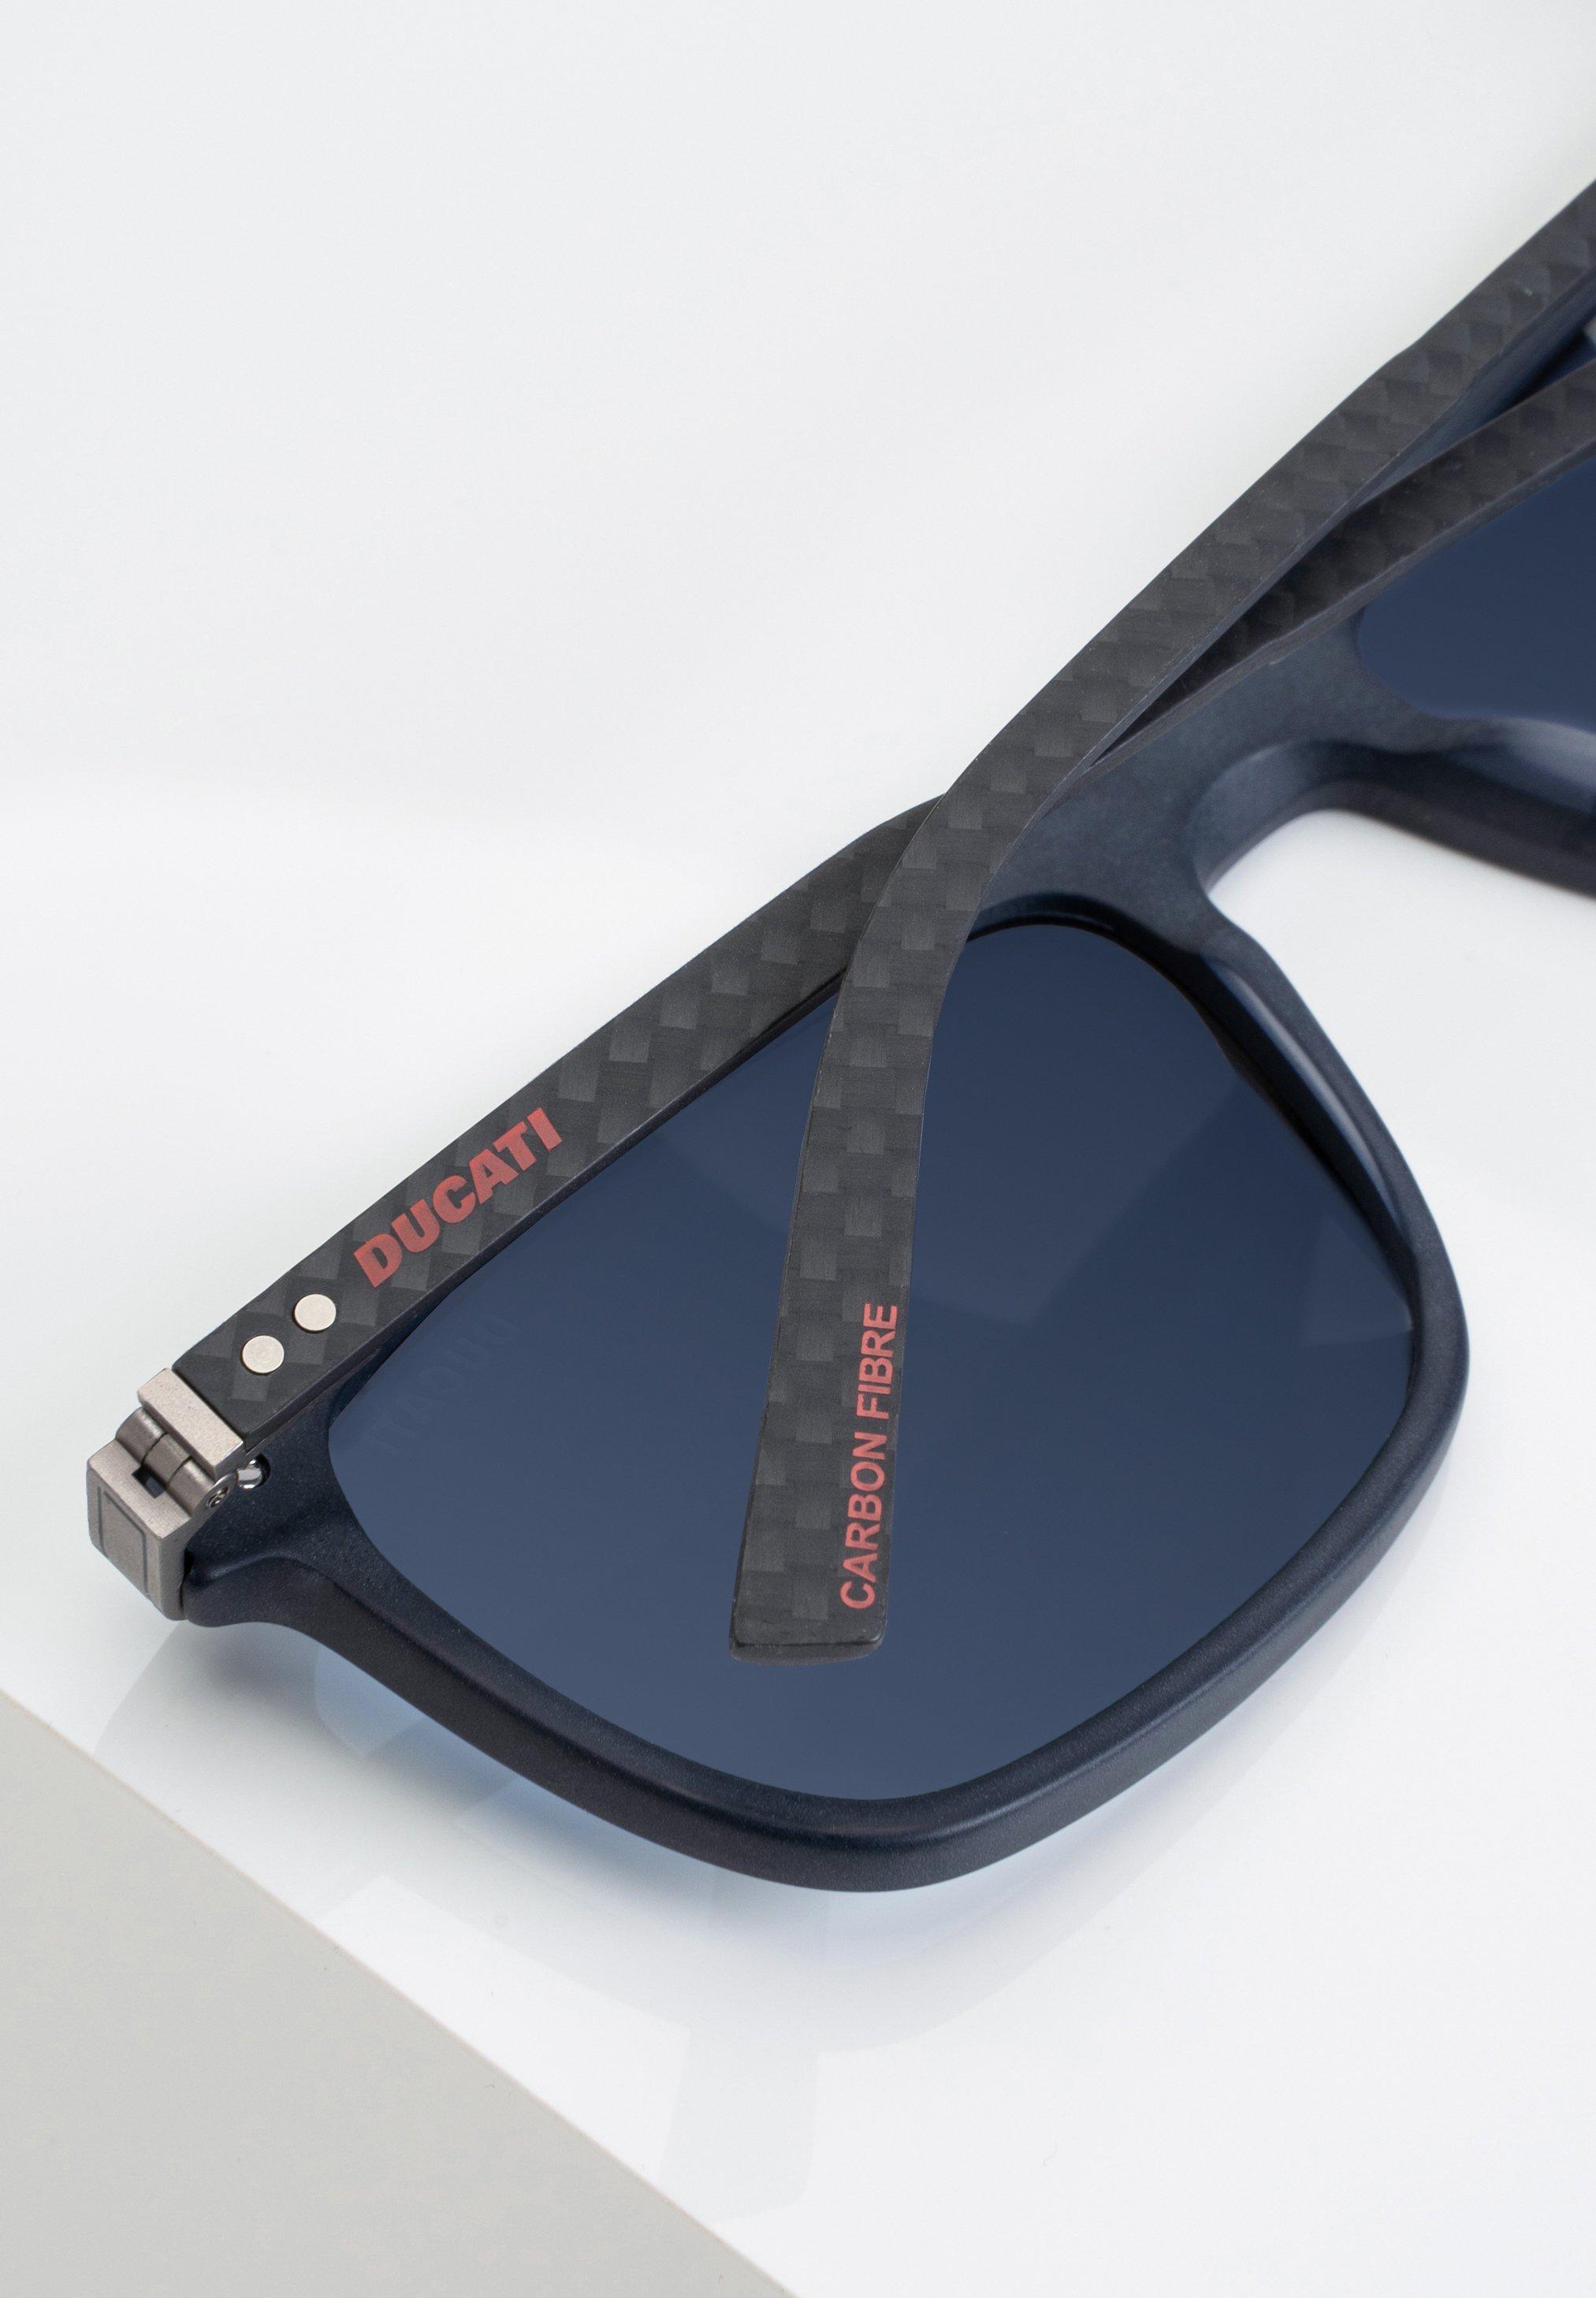 DUCATI Eyewear Sonnenbrille - navy/dunkelblau - Herrenaccessoires 6V51Y